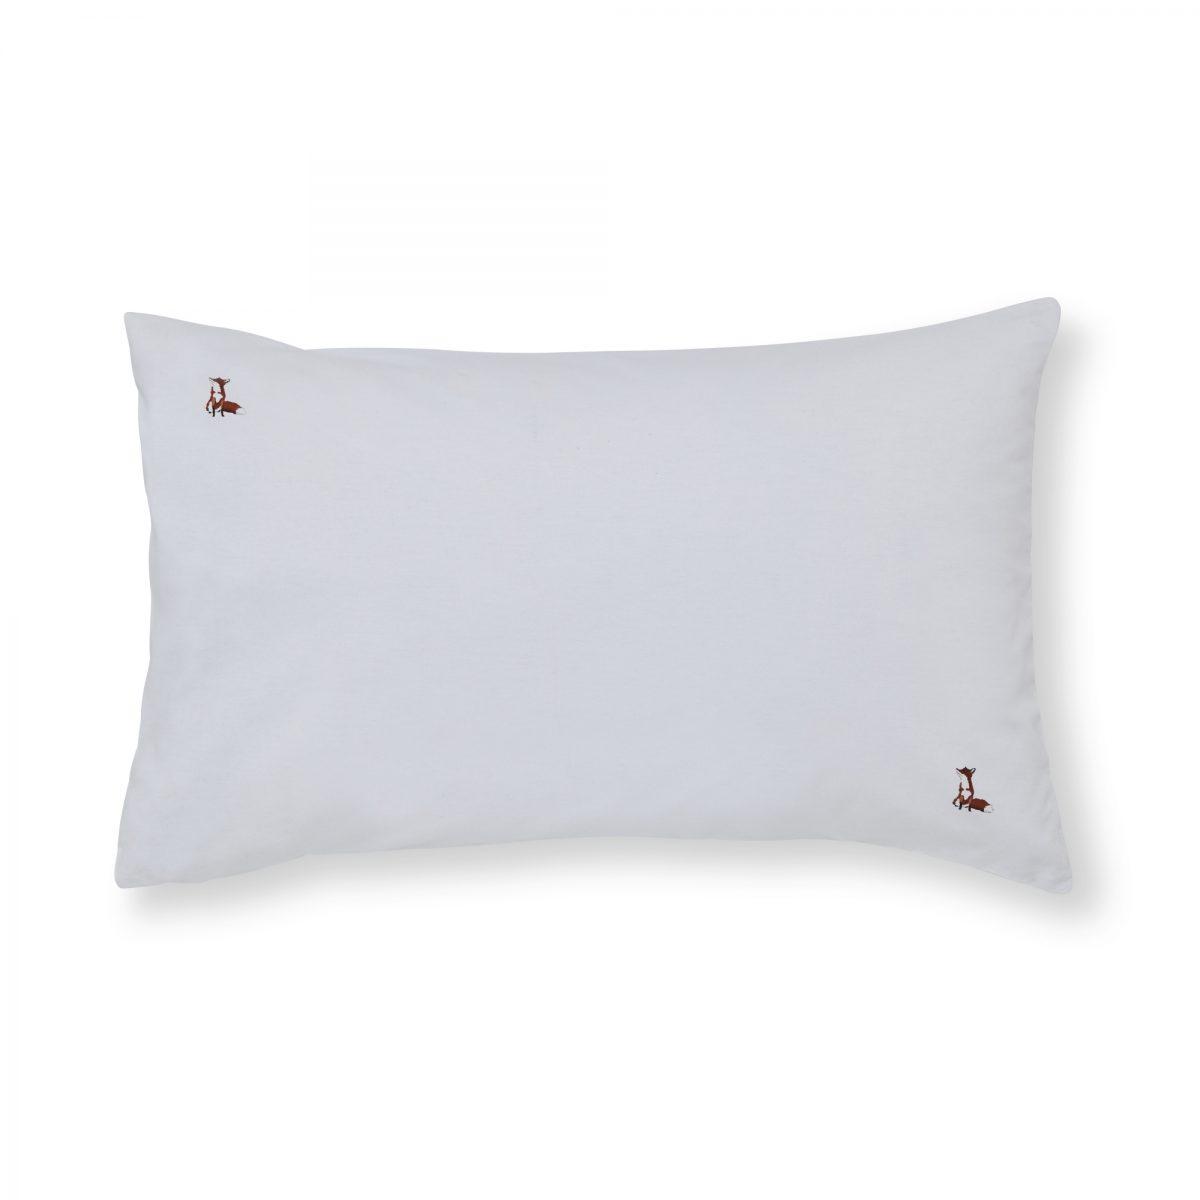 Foxes Pillowcase Cut Out